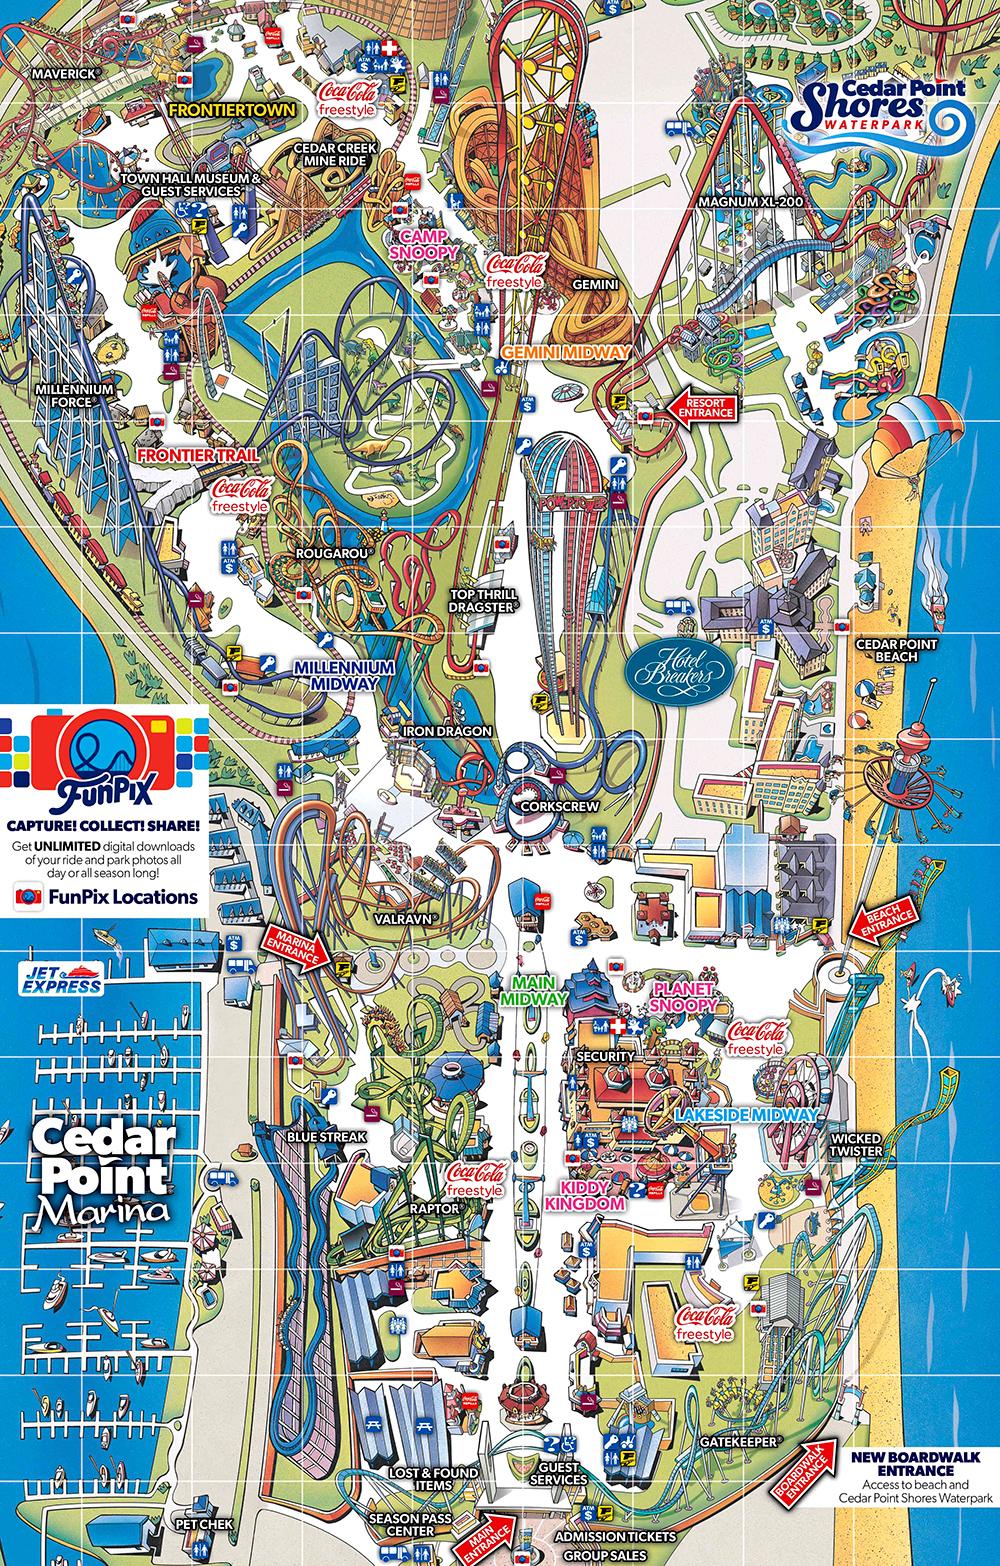 Cedar Point Part 1 From Pleasure Beach To Amusement Park Themerica